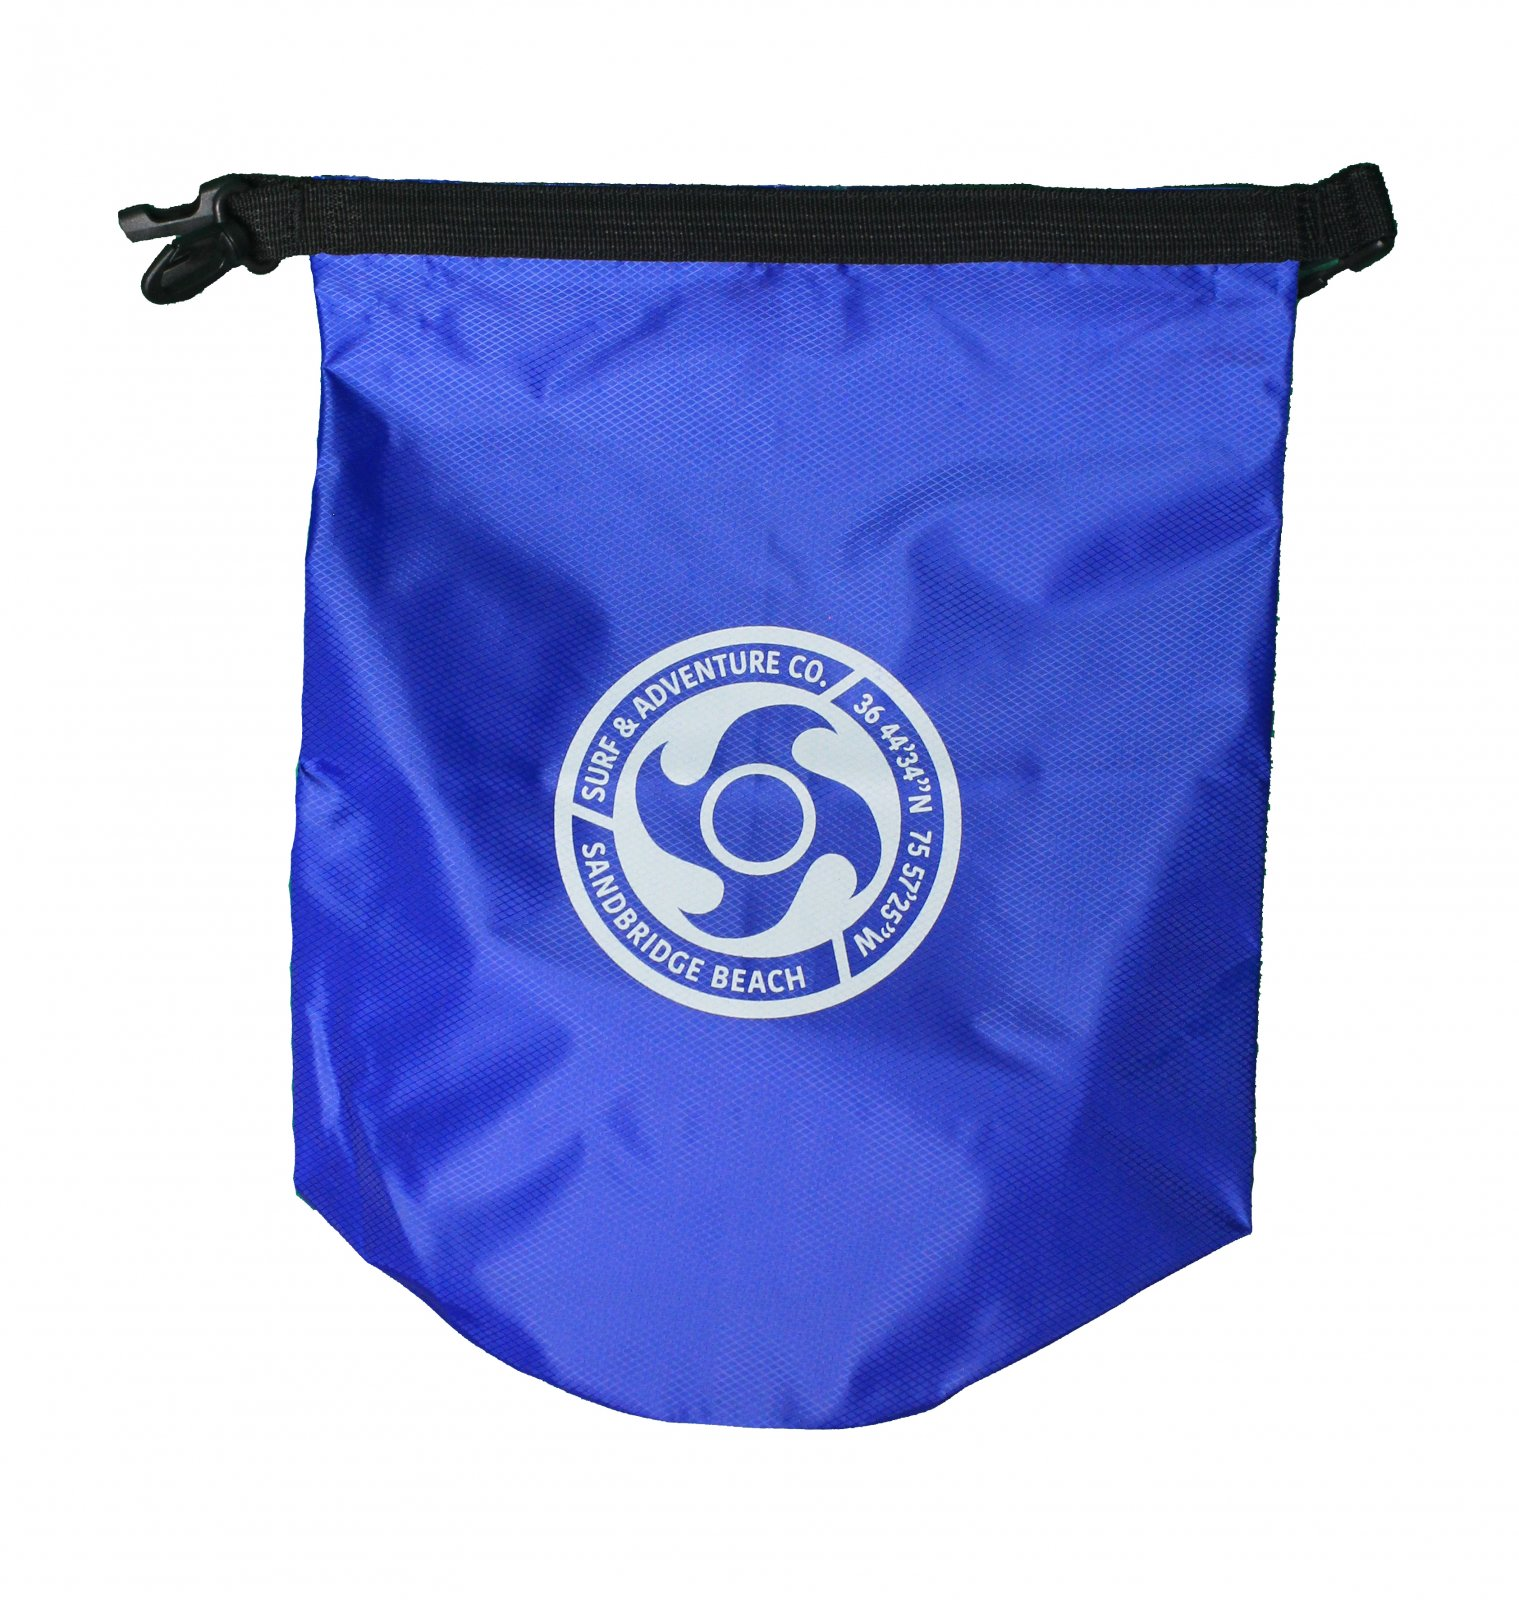 5 Liter Dry bag